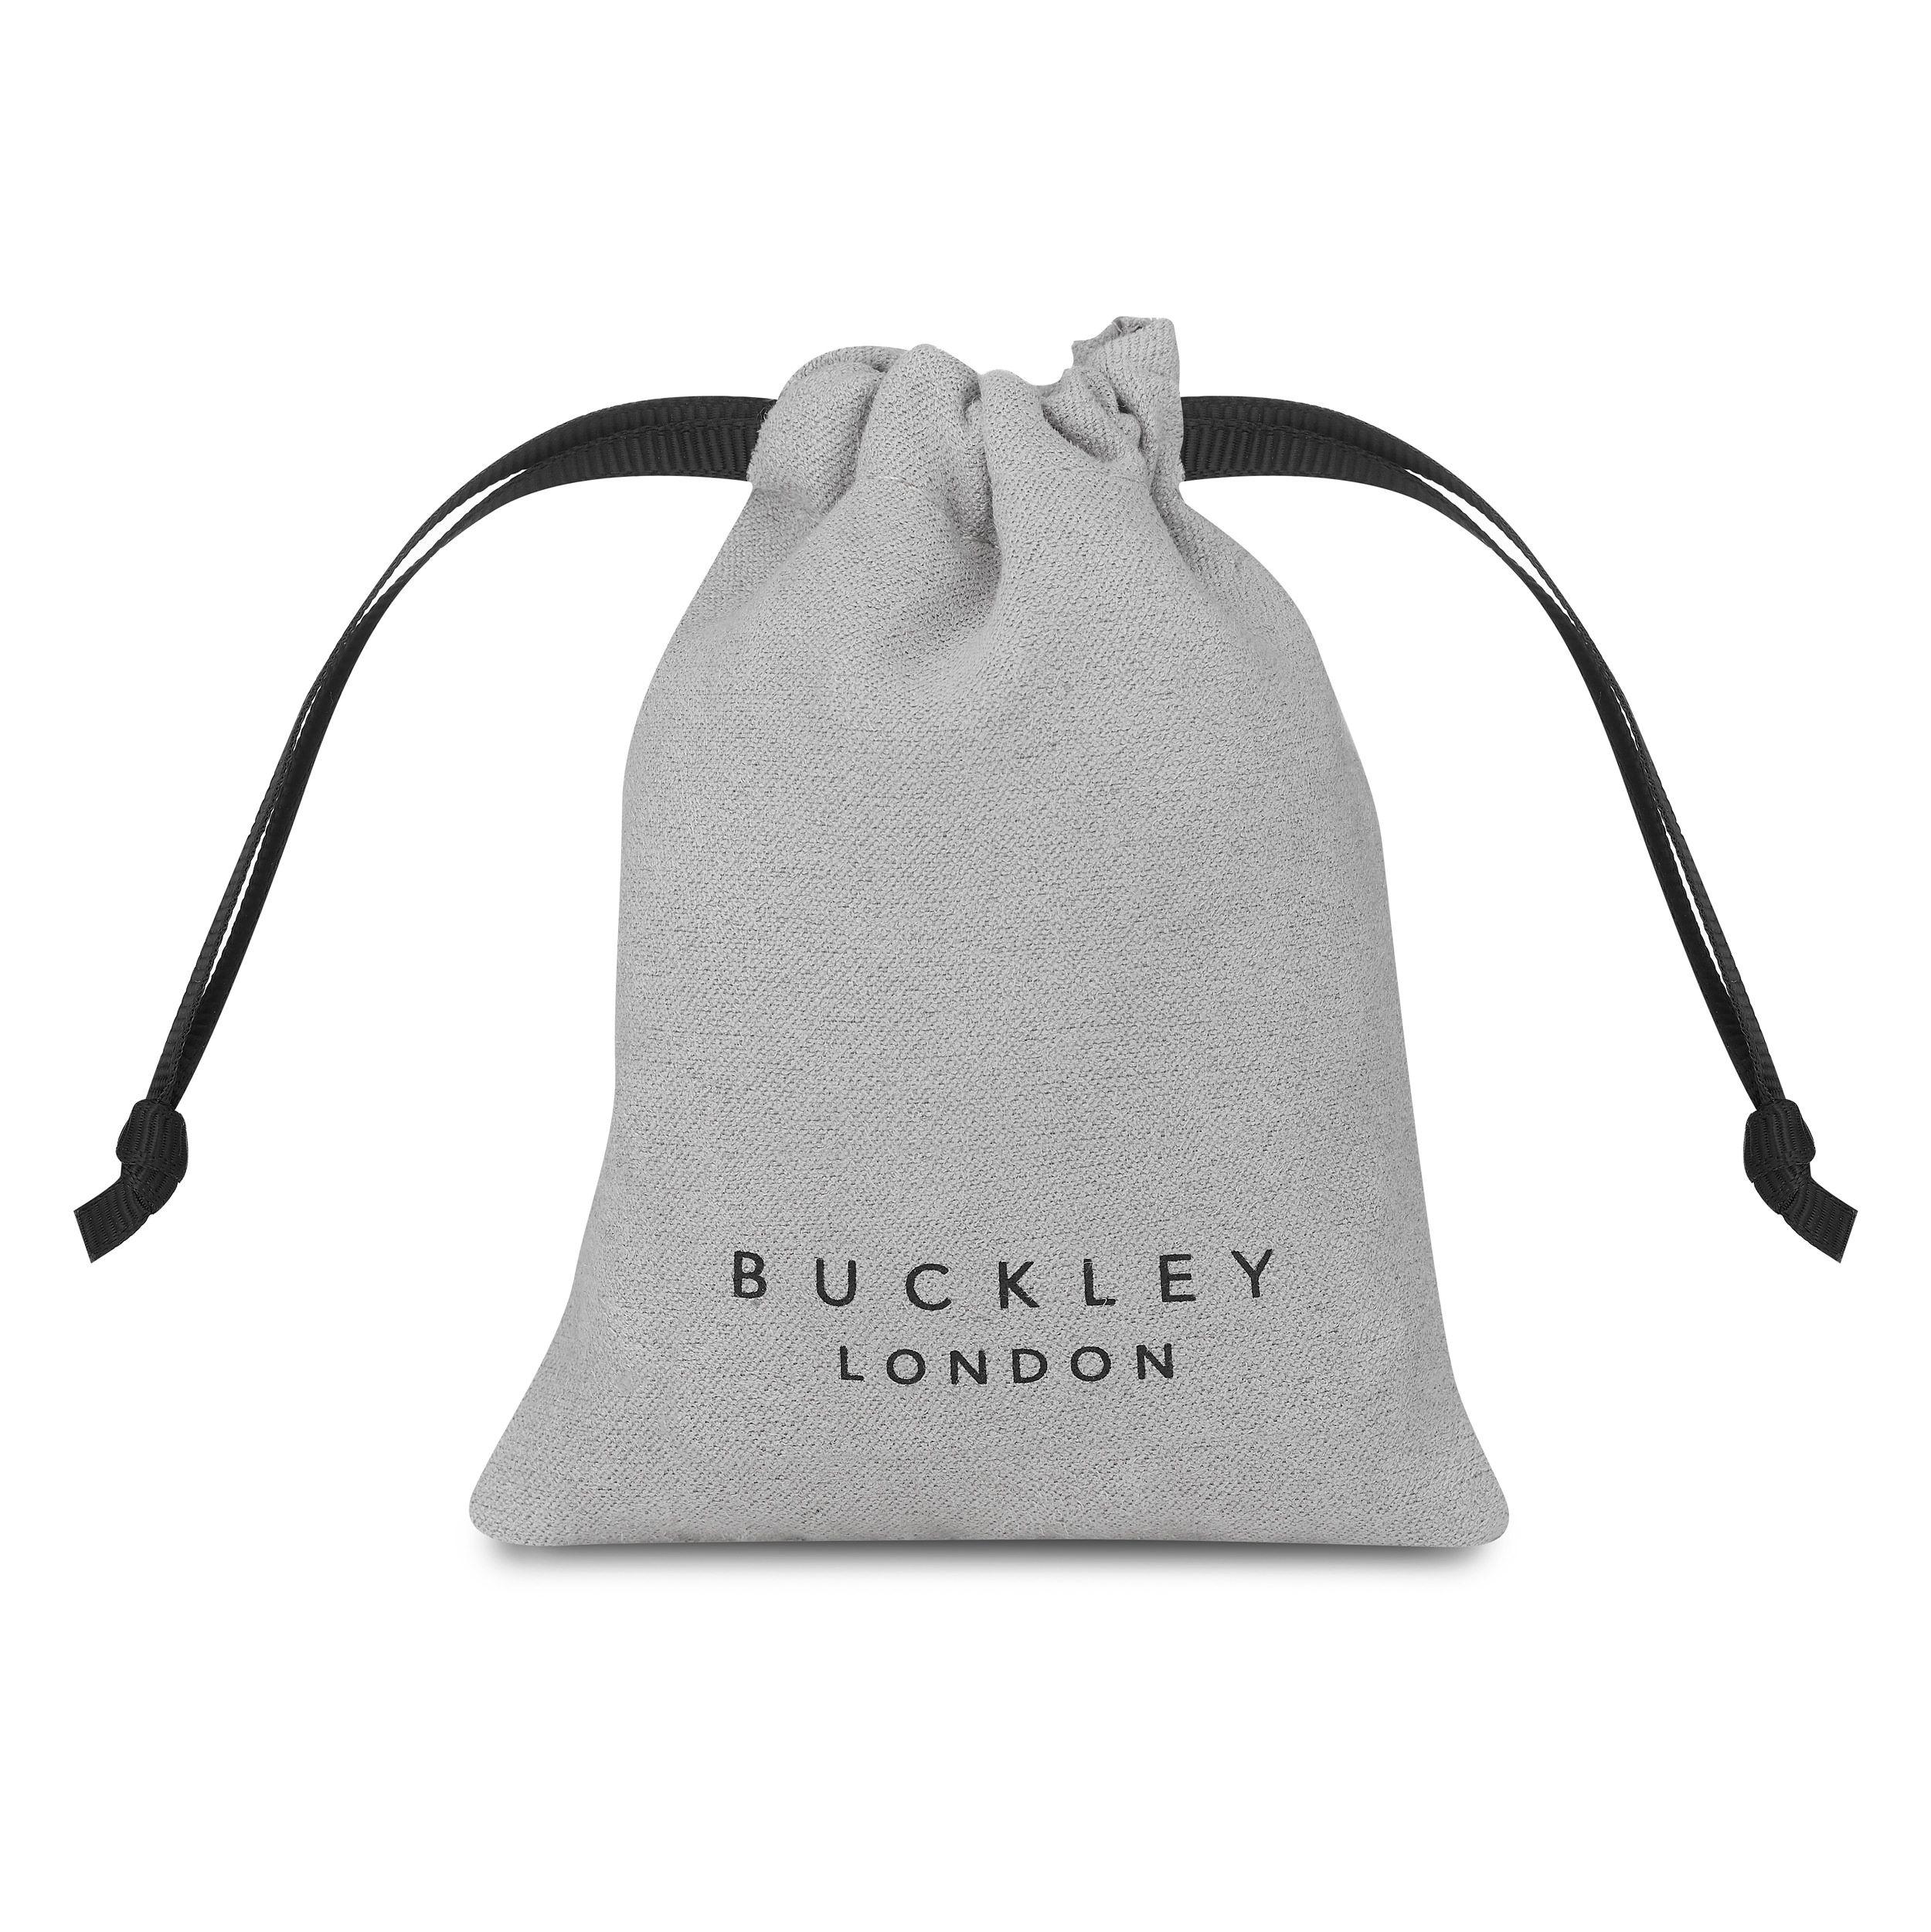 Buckley London Hugs & Kisses '♥' Bracelet - Gold Bag